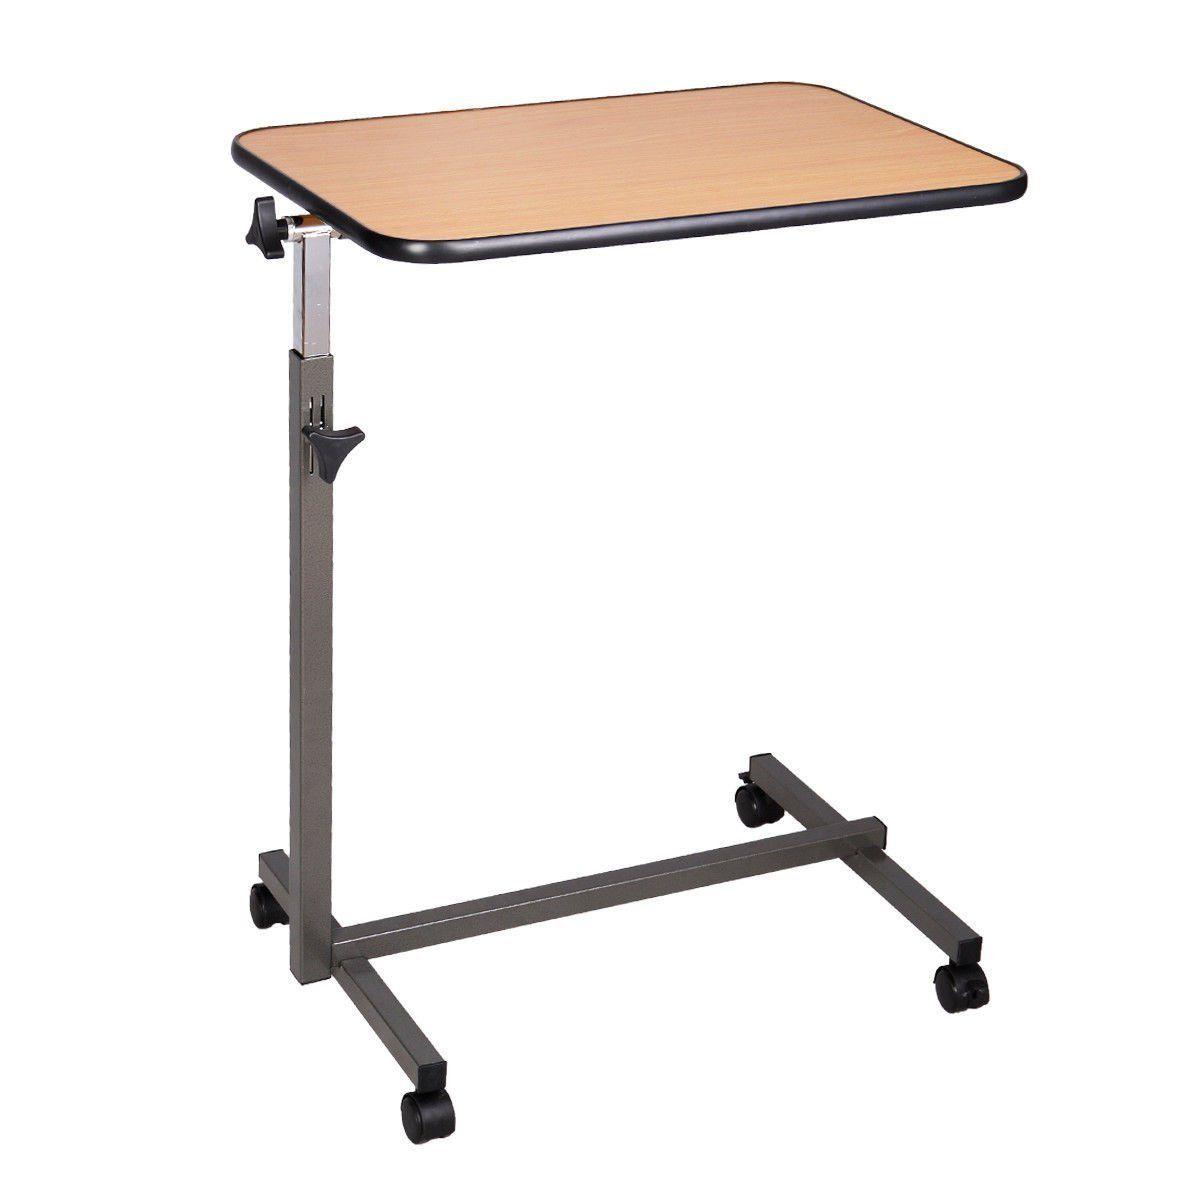 Overbed table food tray non tilt top bed hospital adjustable rolling - Super Buy Overbed Rolling Table Over Bed Laptop Food Tray Hospital Desk With Tilting Top